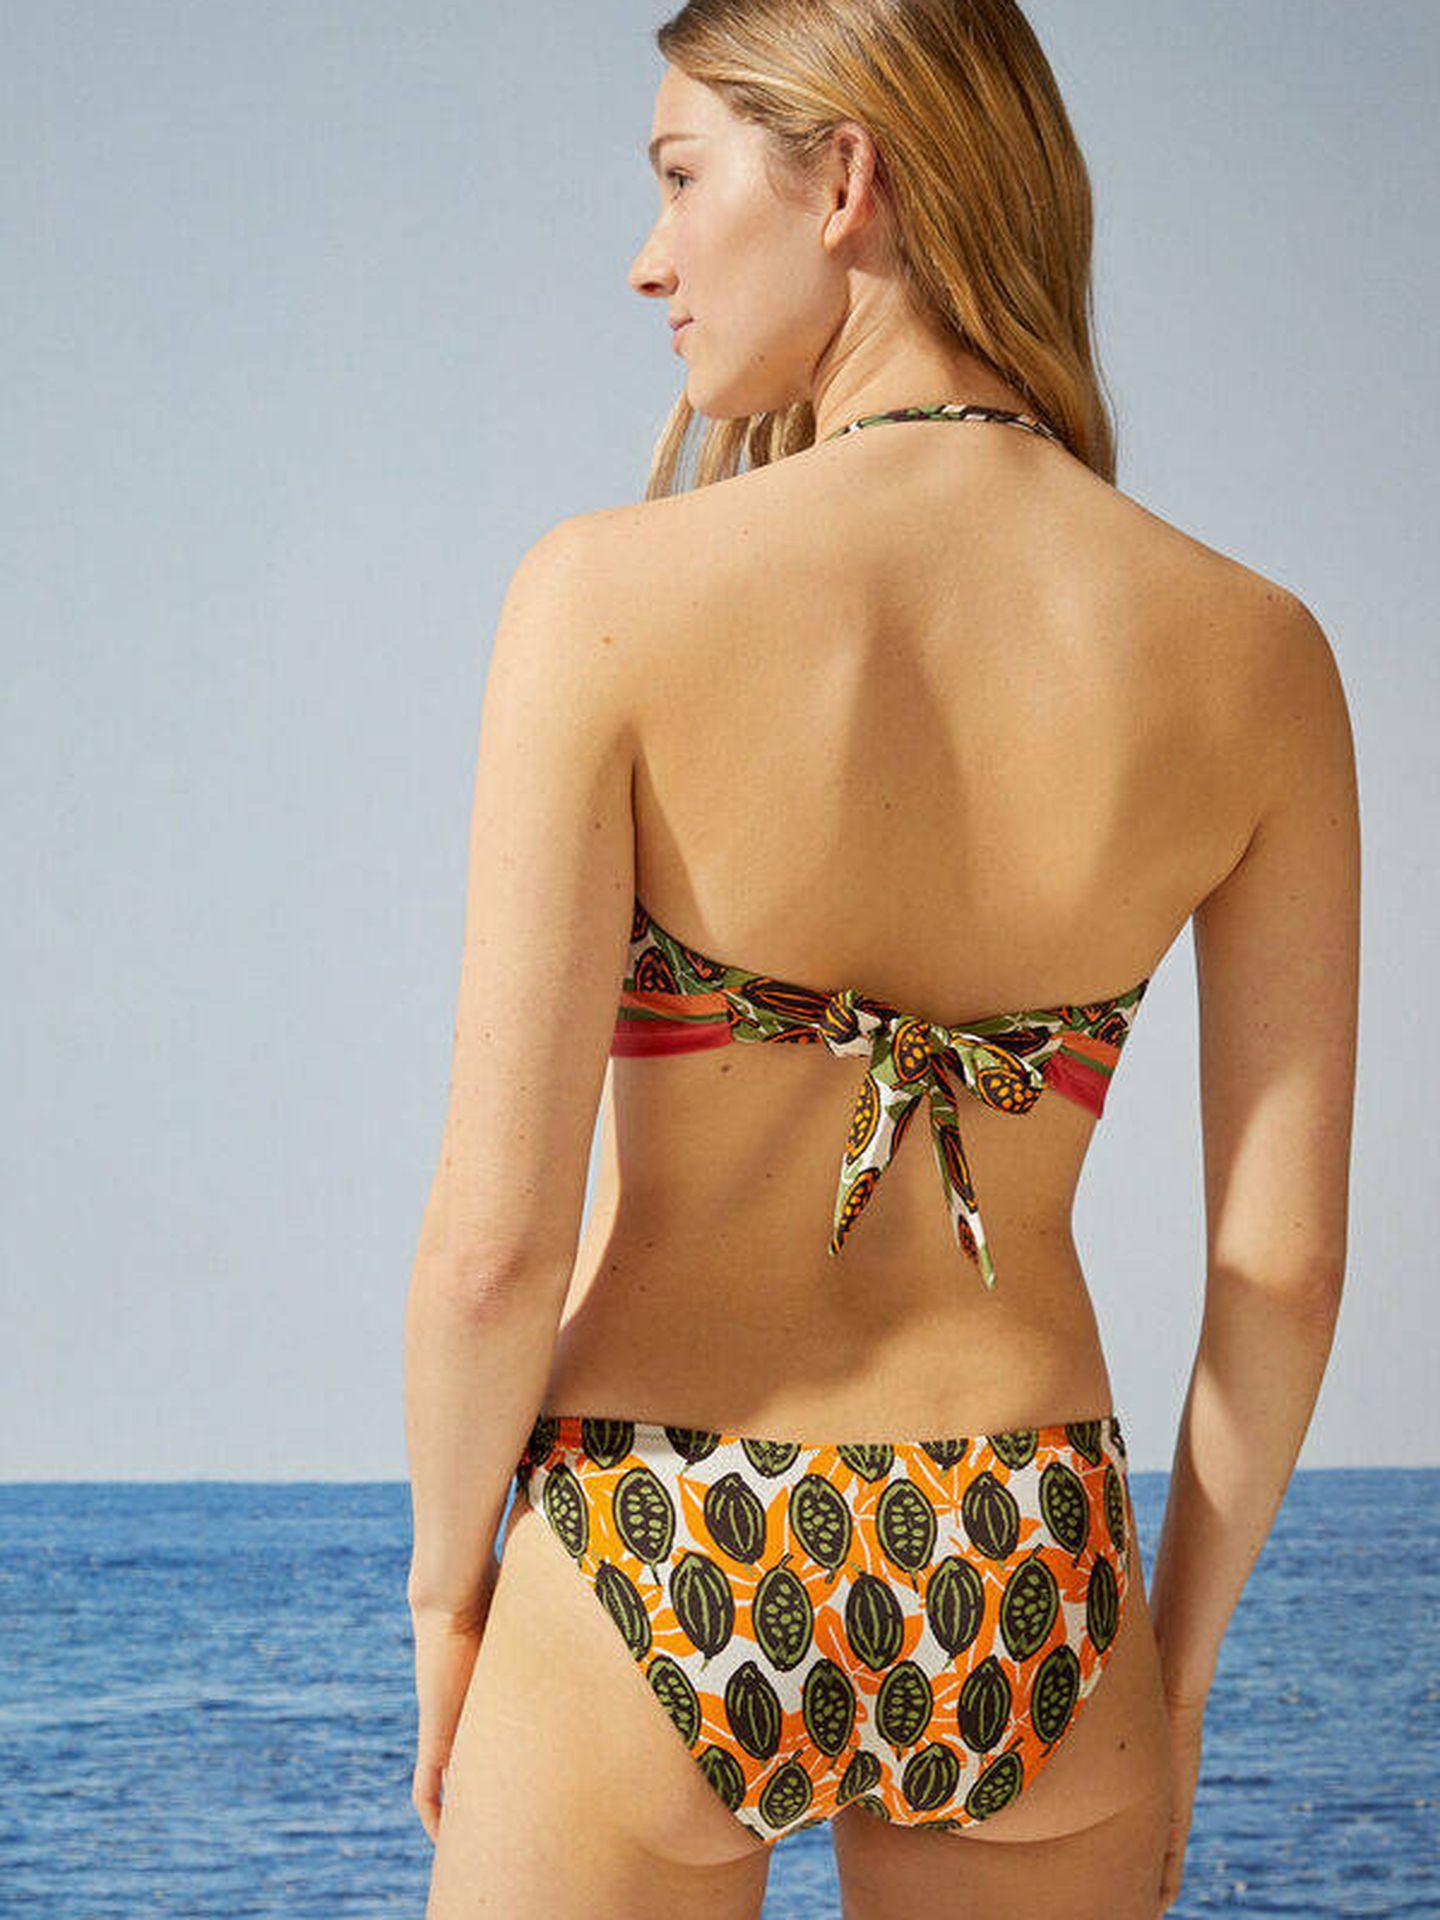 Top de bikini de Women Secret. (Cortesía)